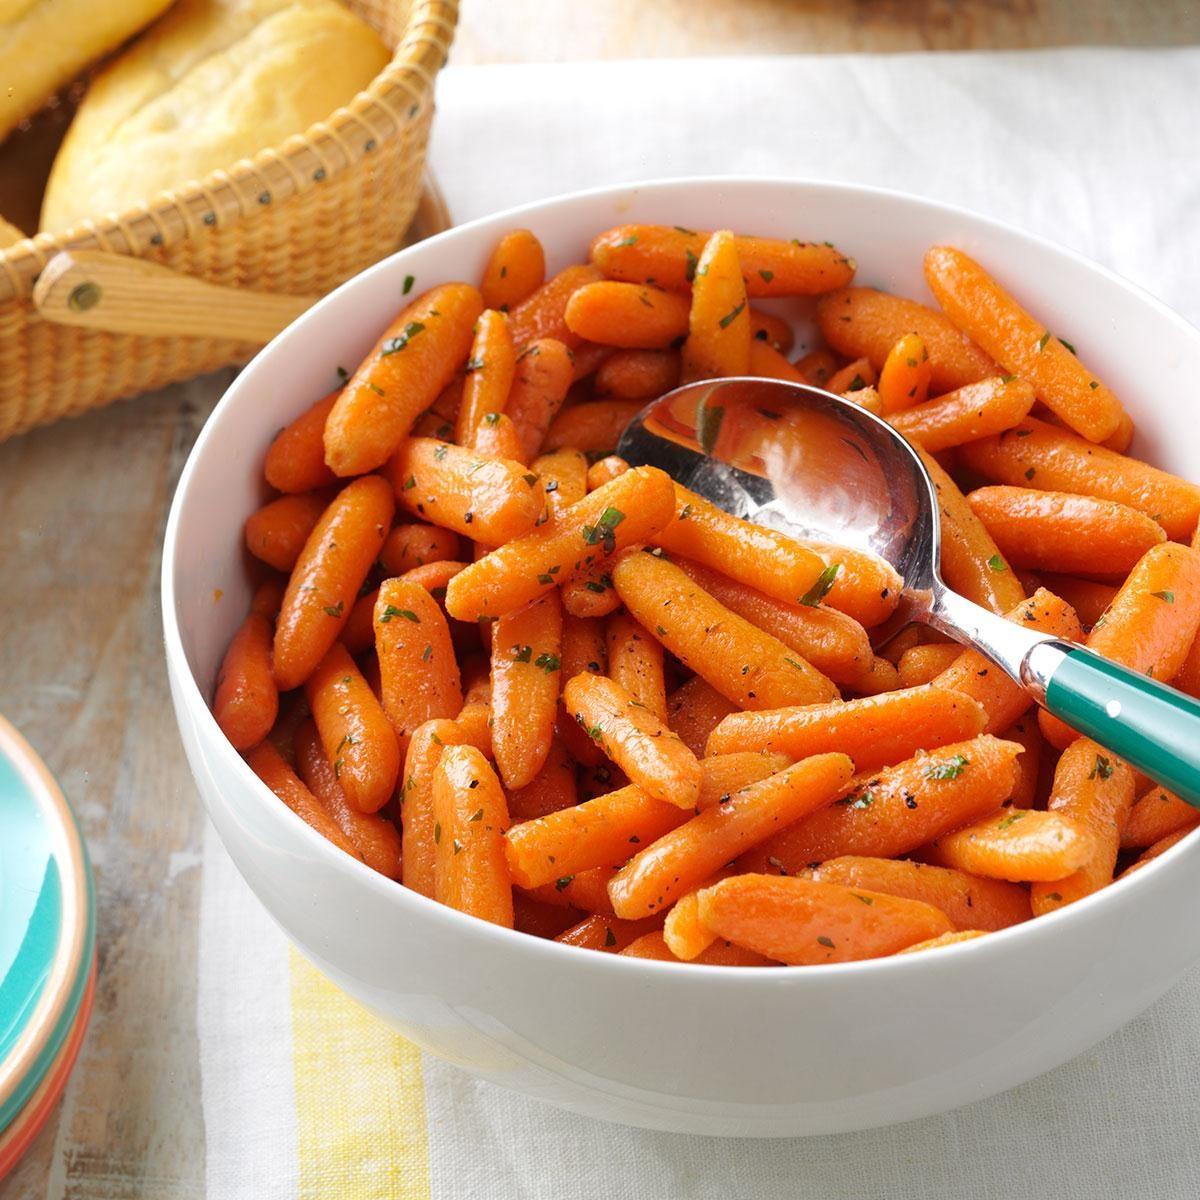 Brandy-Glazed Carrots Recipe | Taste of Home